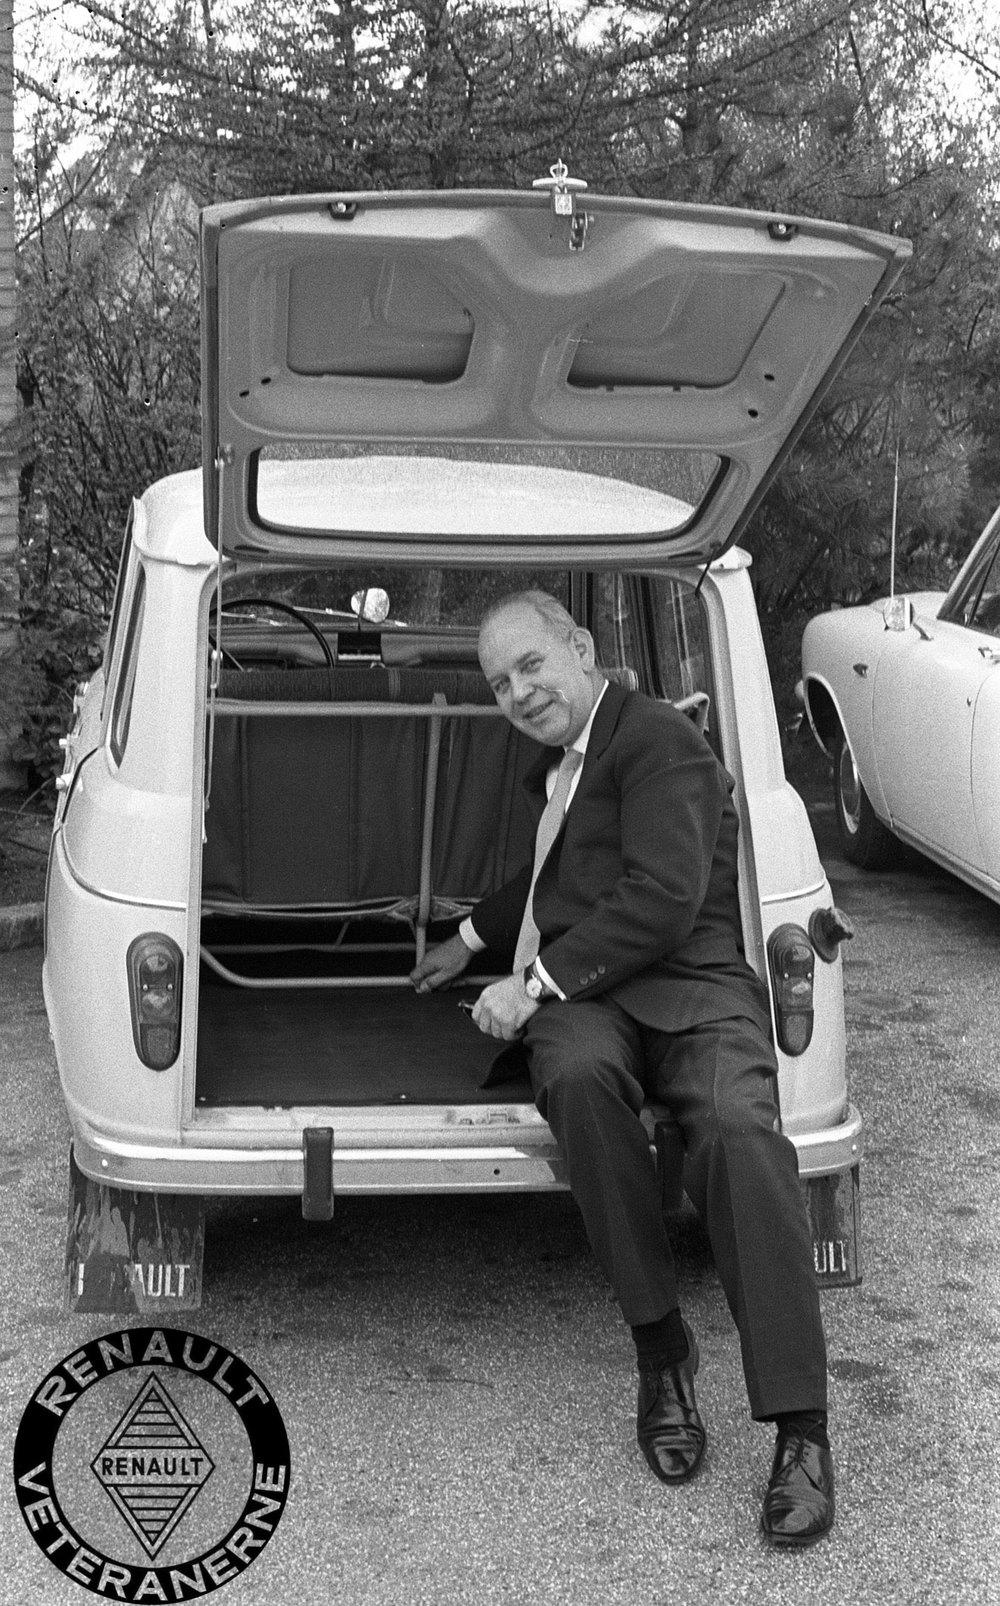 Palle Moe – her i den nye R4 – blev headhuntet til Brdr. Friis-Hansen fra Ford i 1962. I 1971 afløste han Ejnar Friis-Hansen som administrerende direktør.